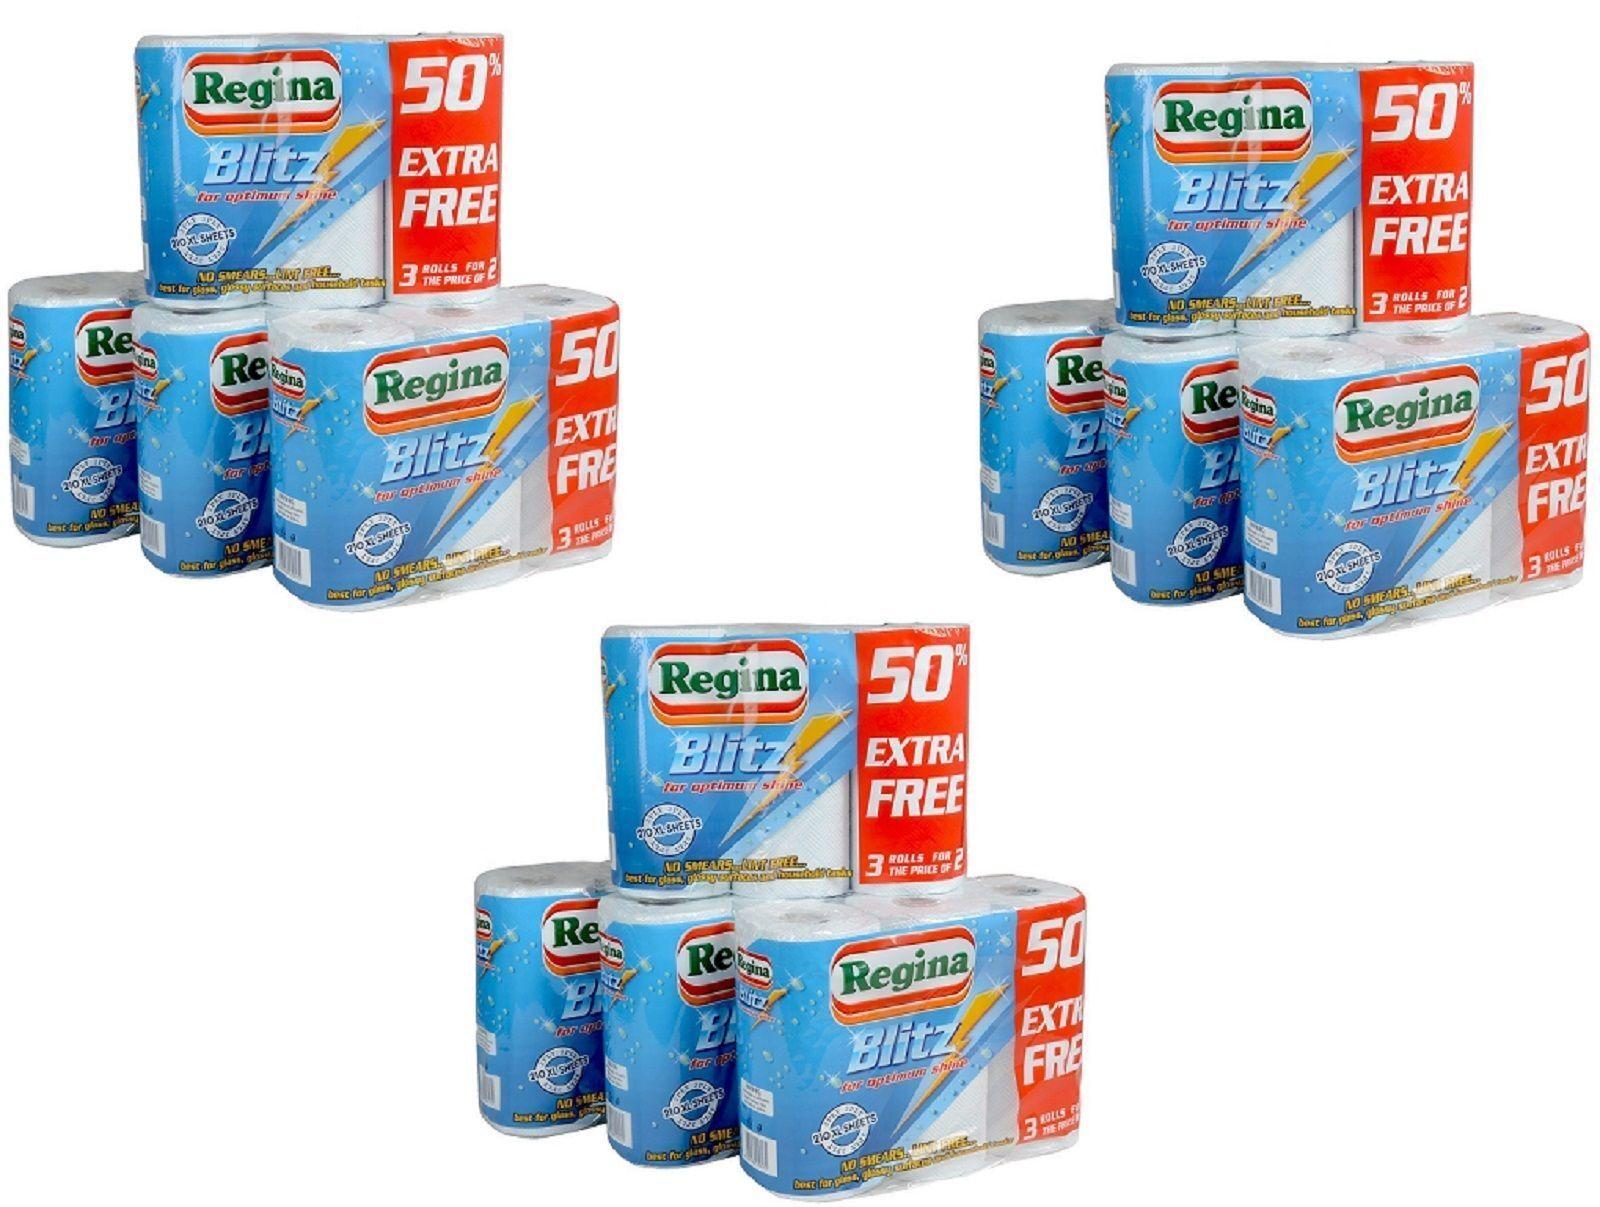 48 Regina Blitz 3 Ply Kitchen Towel Paper Rolls CHEAPEST BULK Buy | eBay